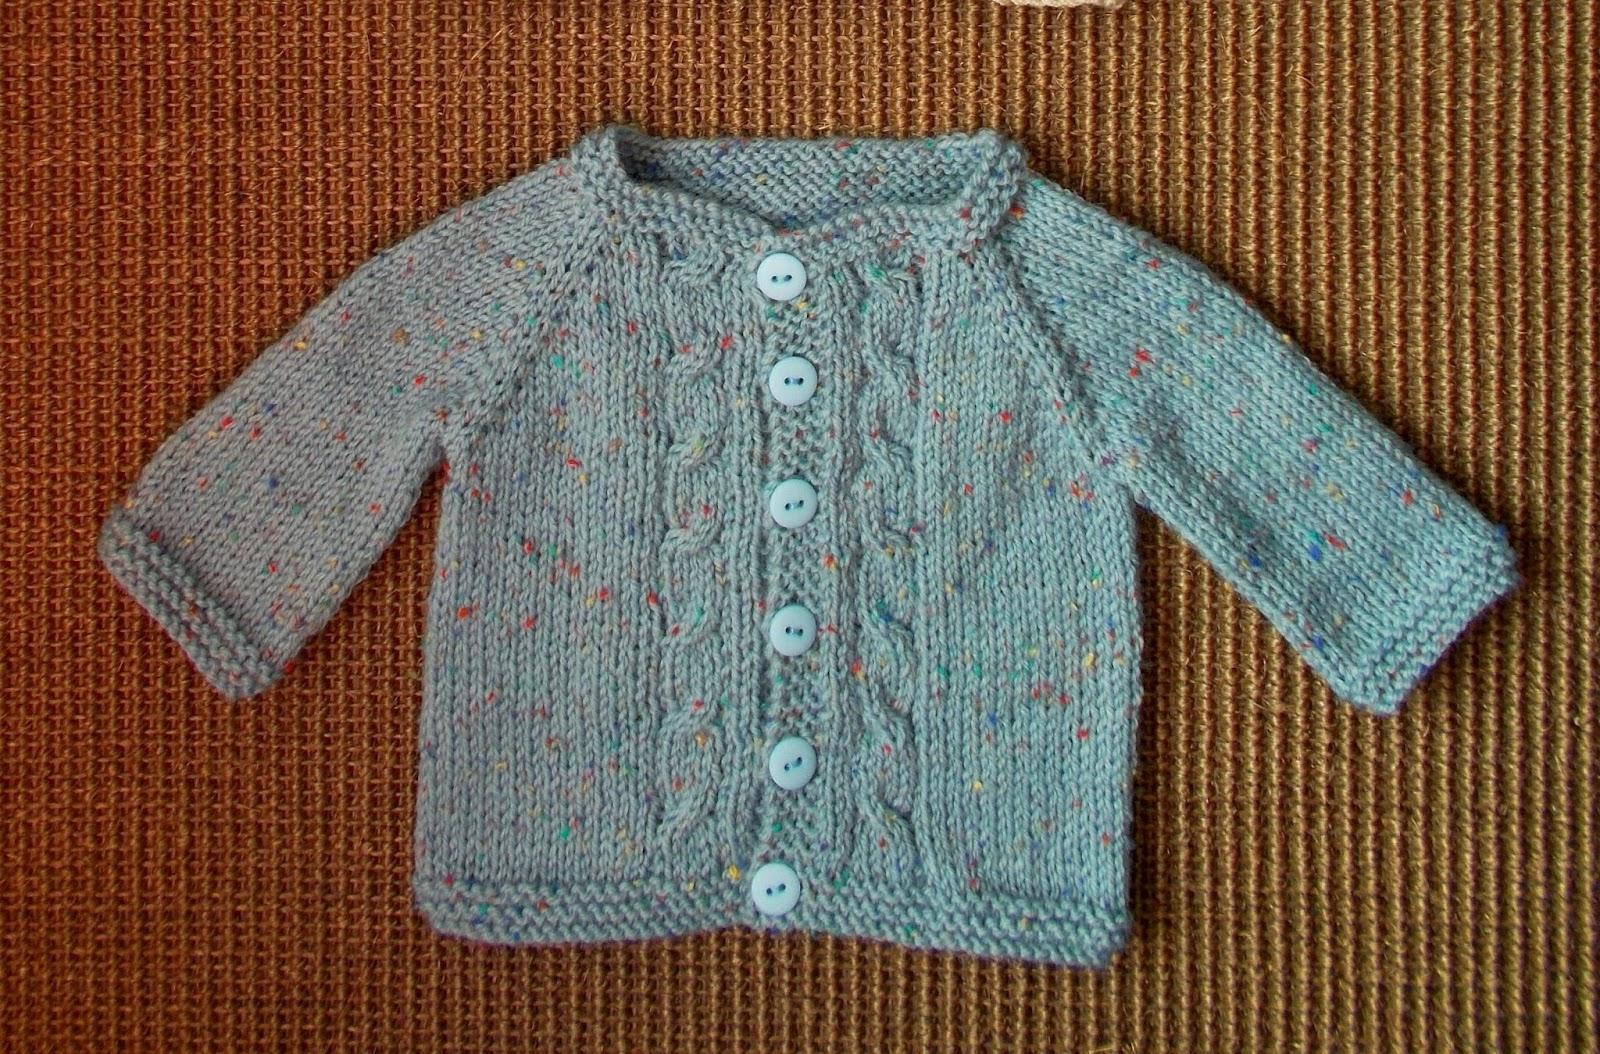 Baby Jacket Knitting Pattern : mariannas lazy daisy days: Max Baby Cardigan Jacket - with eyelet raglan...